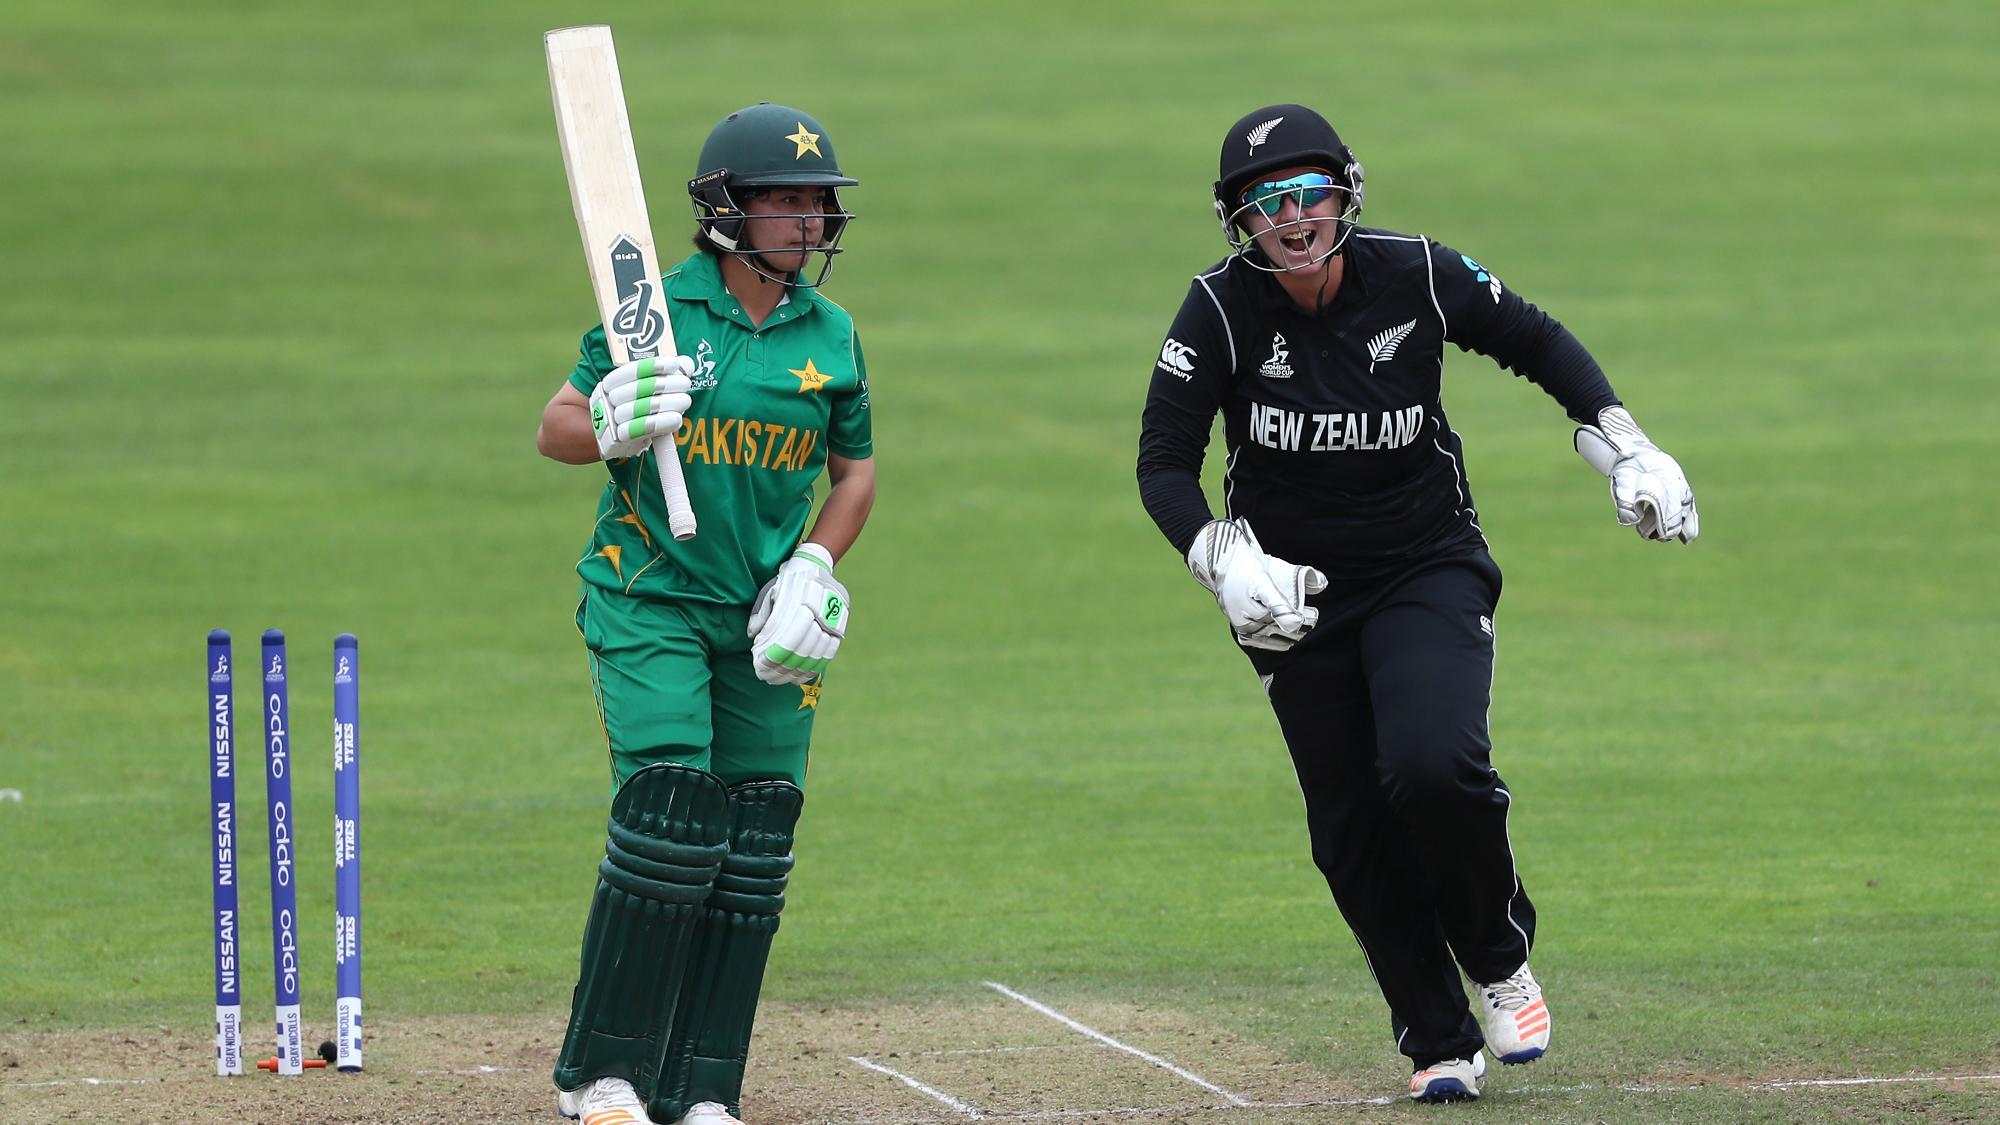 Pakistan vs New Zealand, 2nd Test Day 3 Highlights : Nov 27, 2018